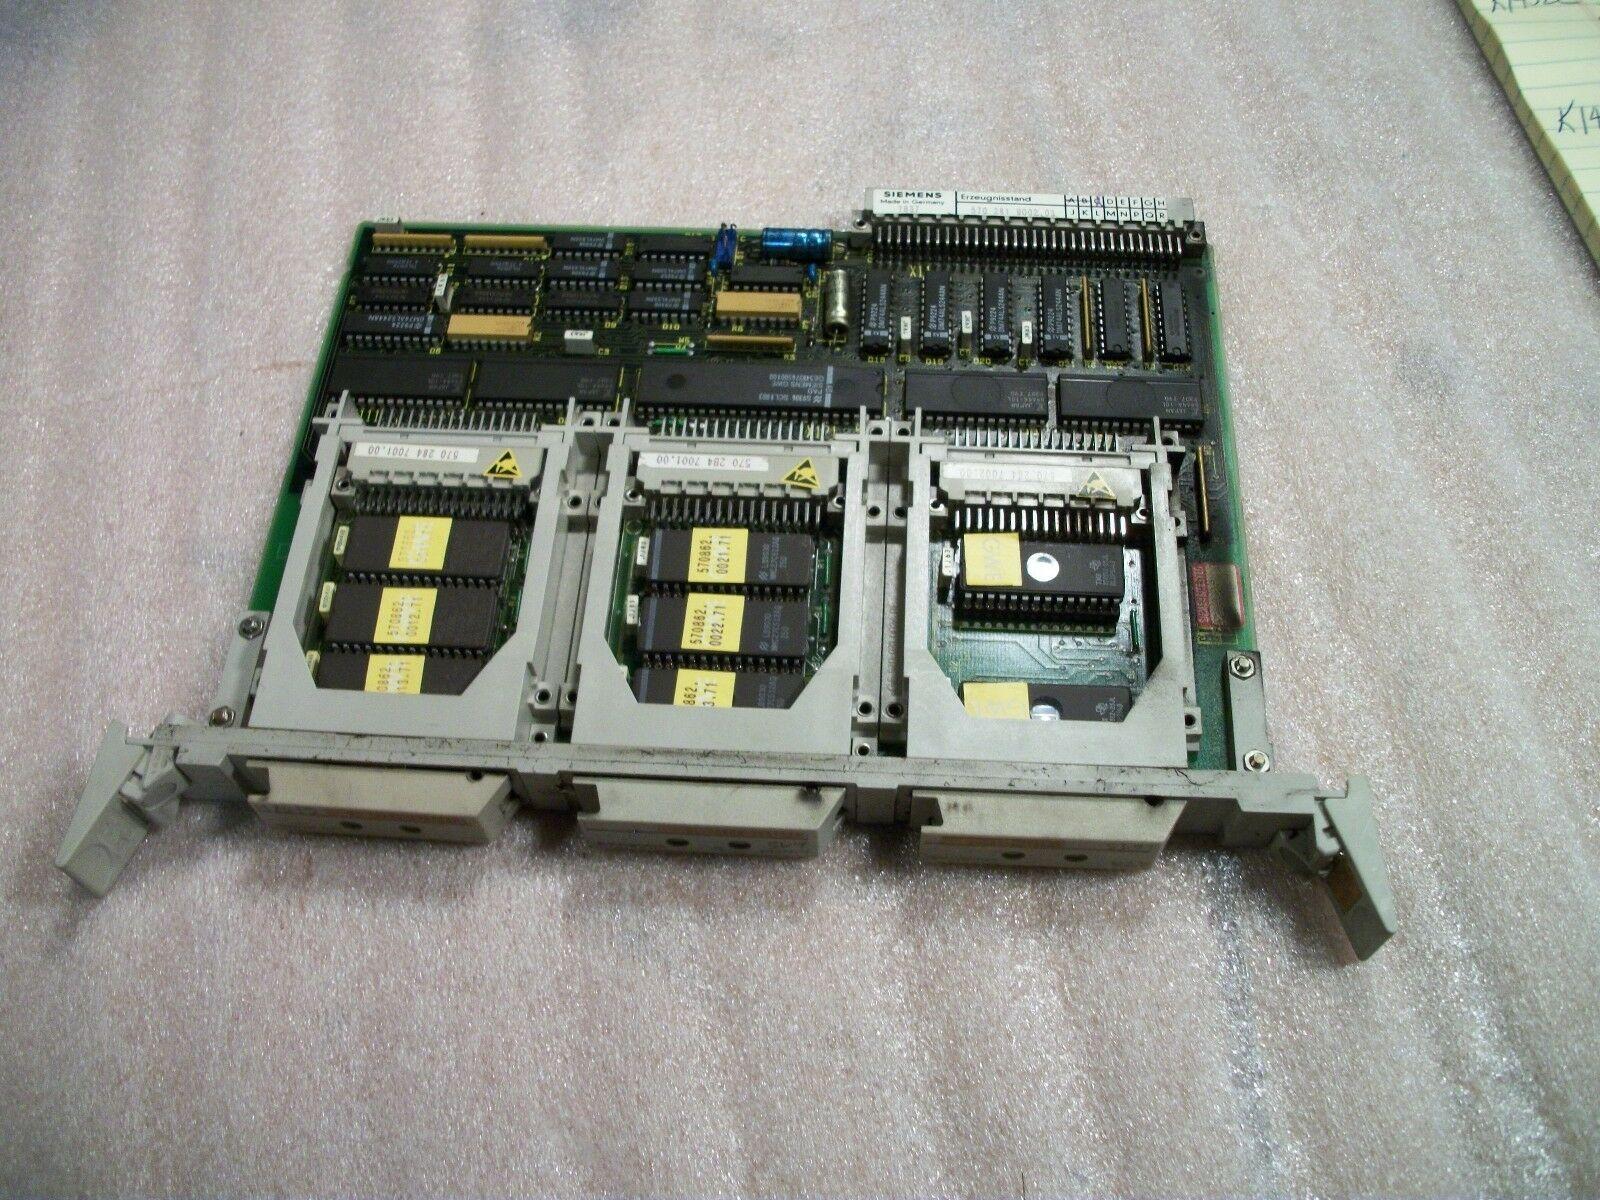 Siemens CNC Control Circuit Board 570 281 9002.3 / OE 570281.0001.03